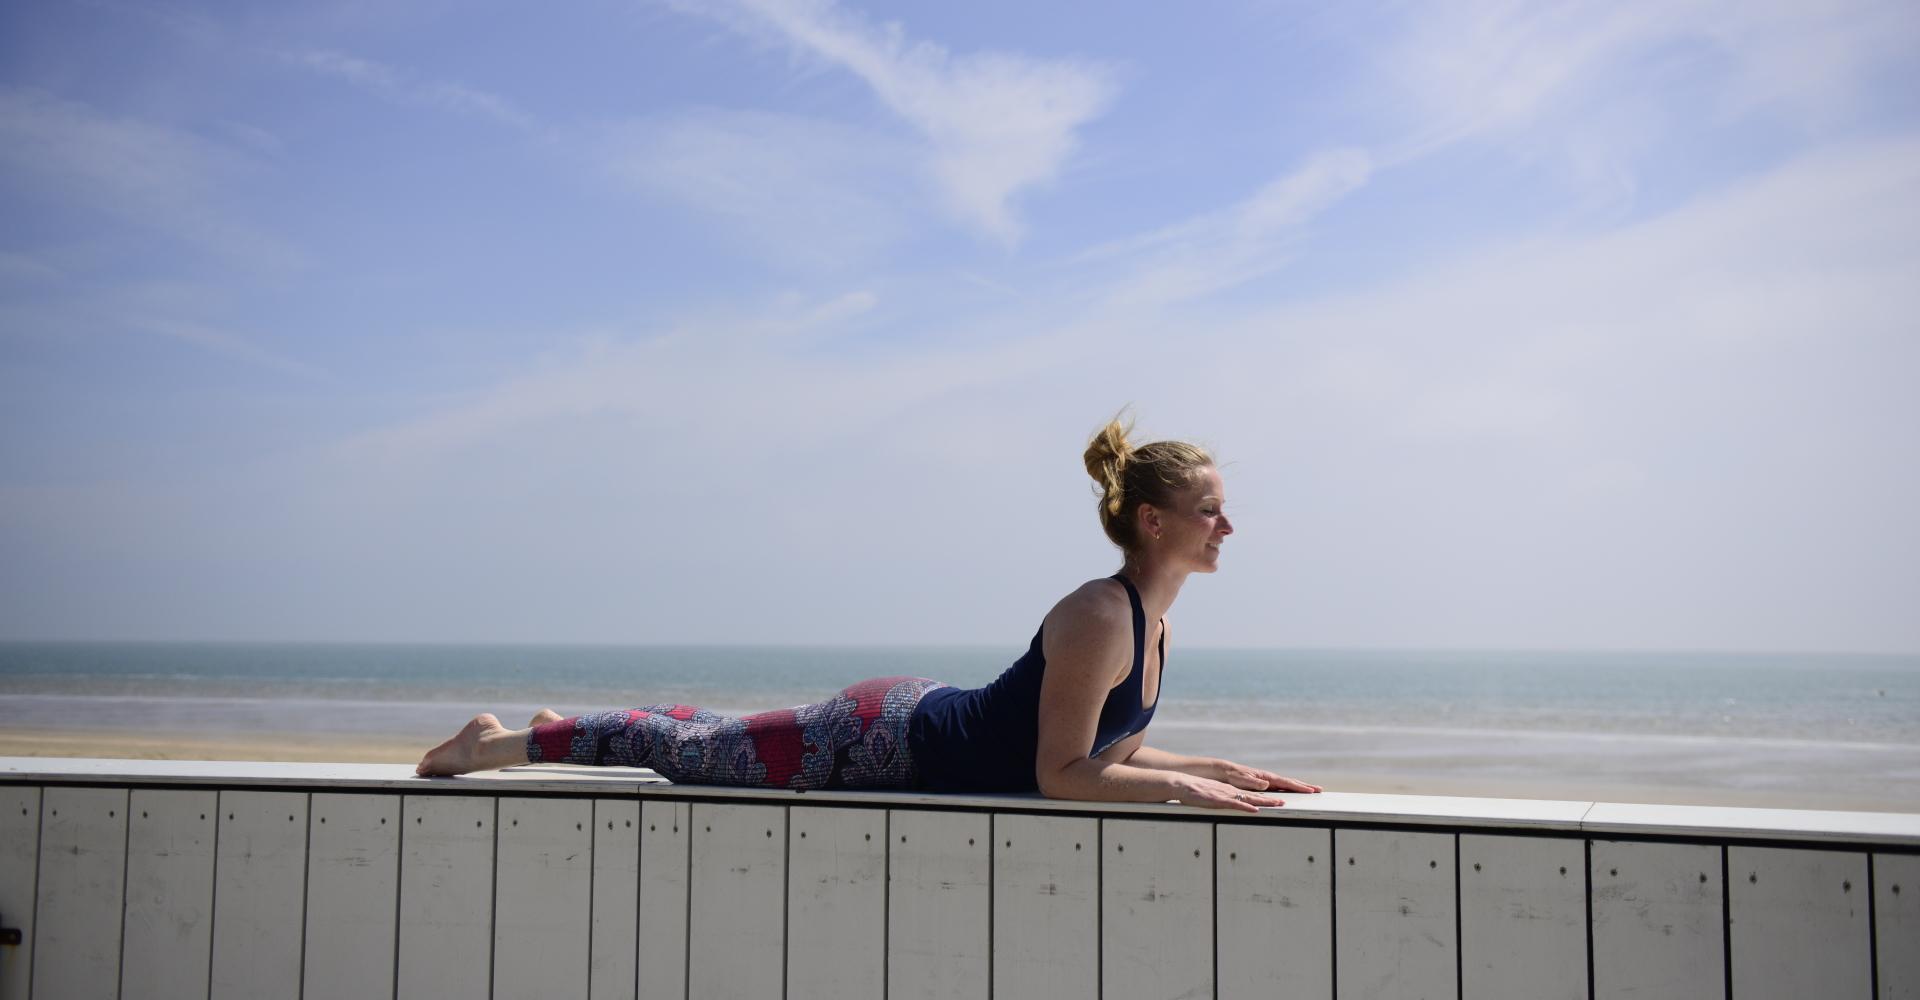 Marjolein doet yogahouding Sphinx - Salamba Bhujangasana op het strand